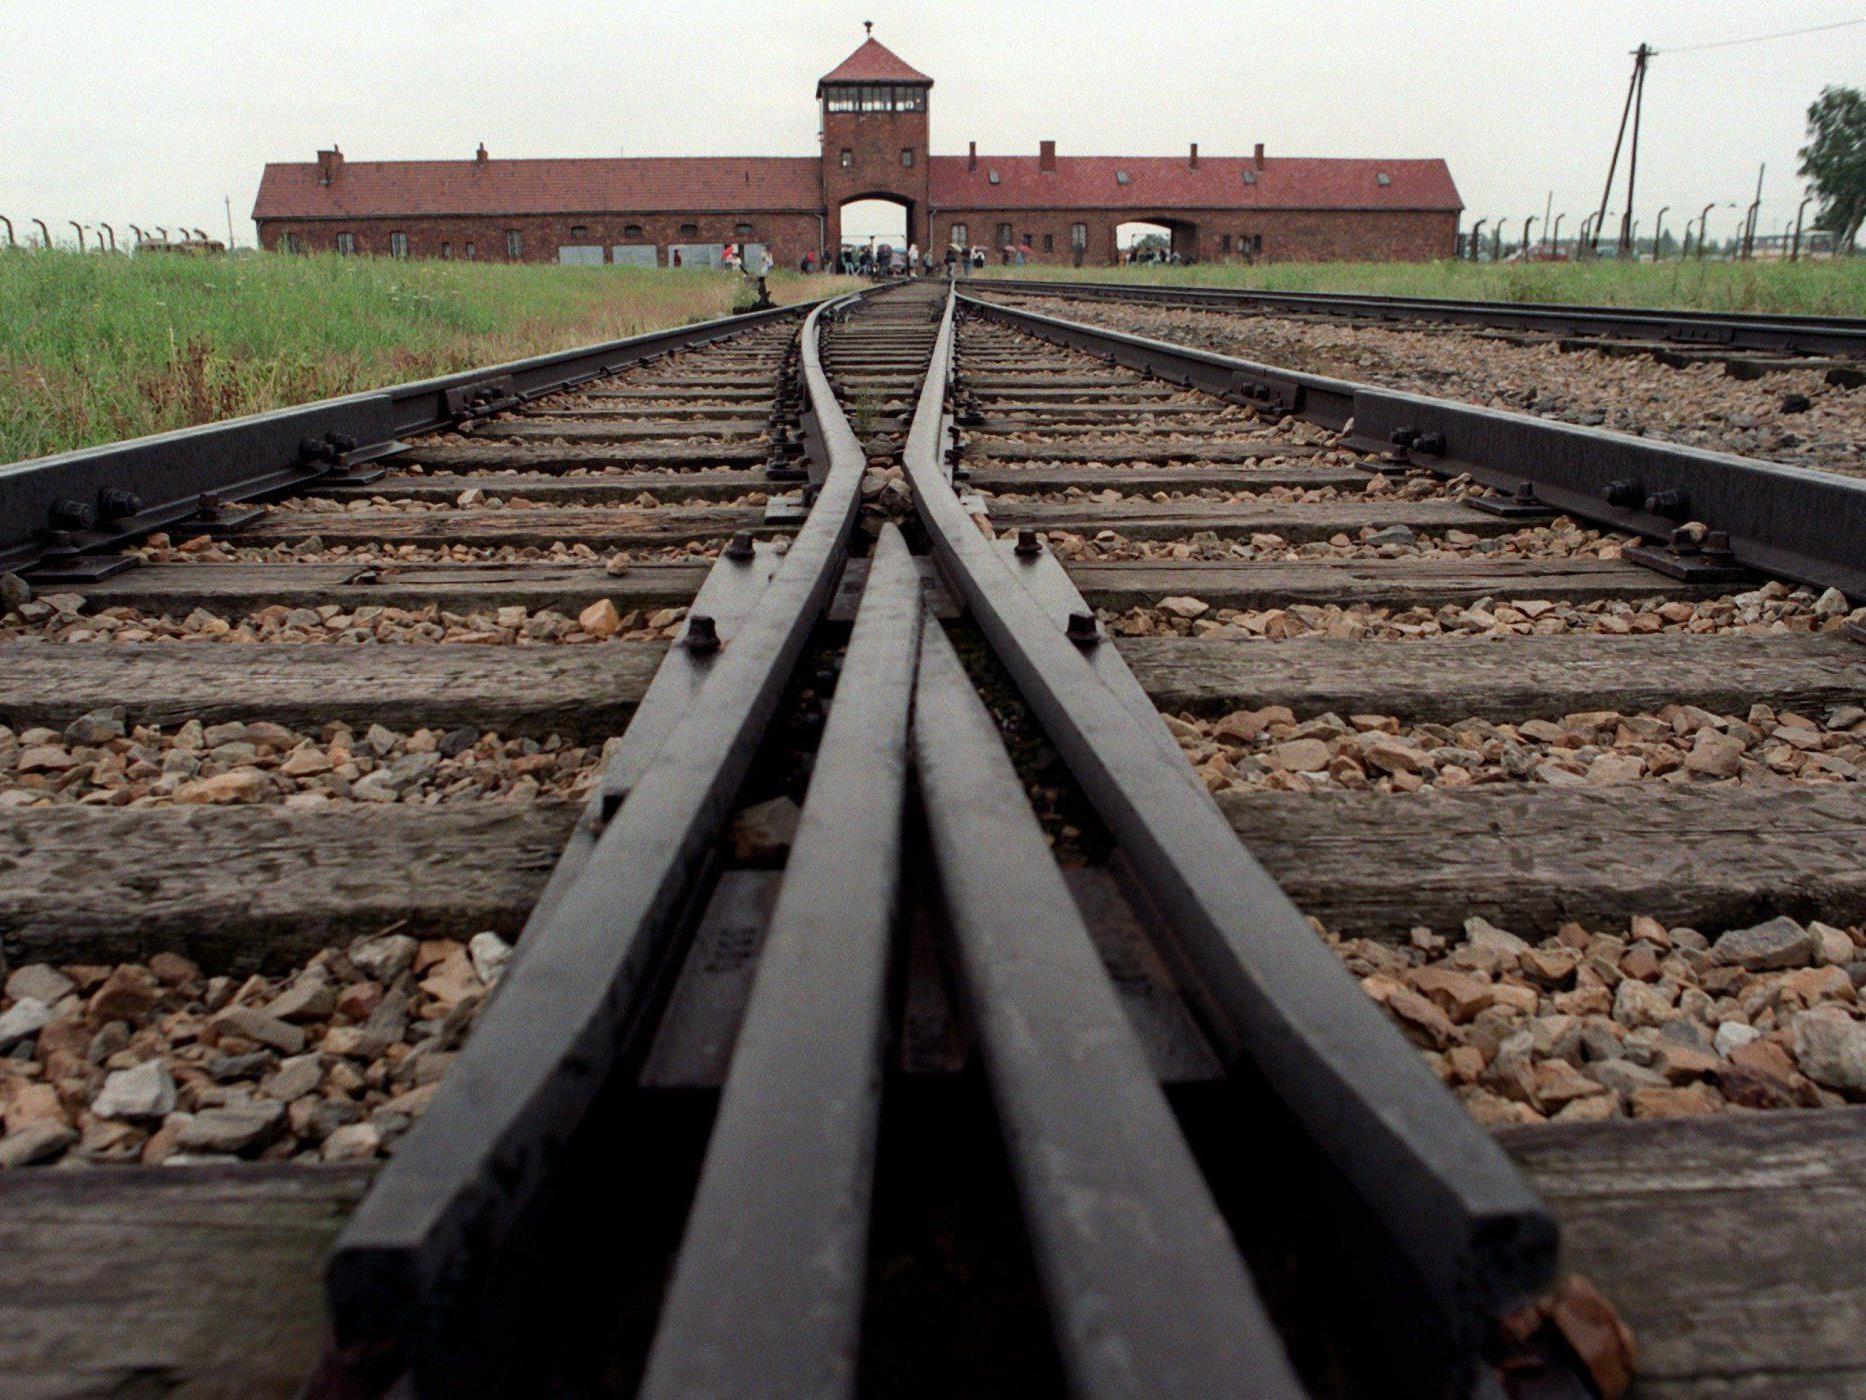 Heute 93-jähriger, ehemaliger KZ-Wächter wegen Beihilfe zum Mord angeklagt.